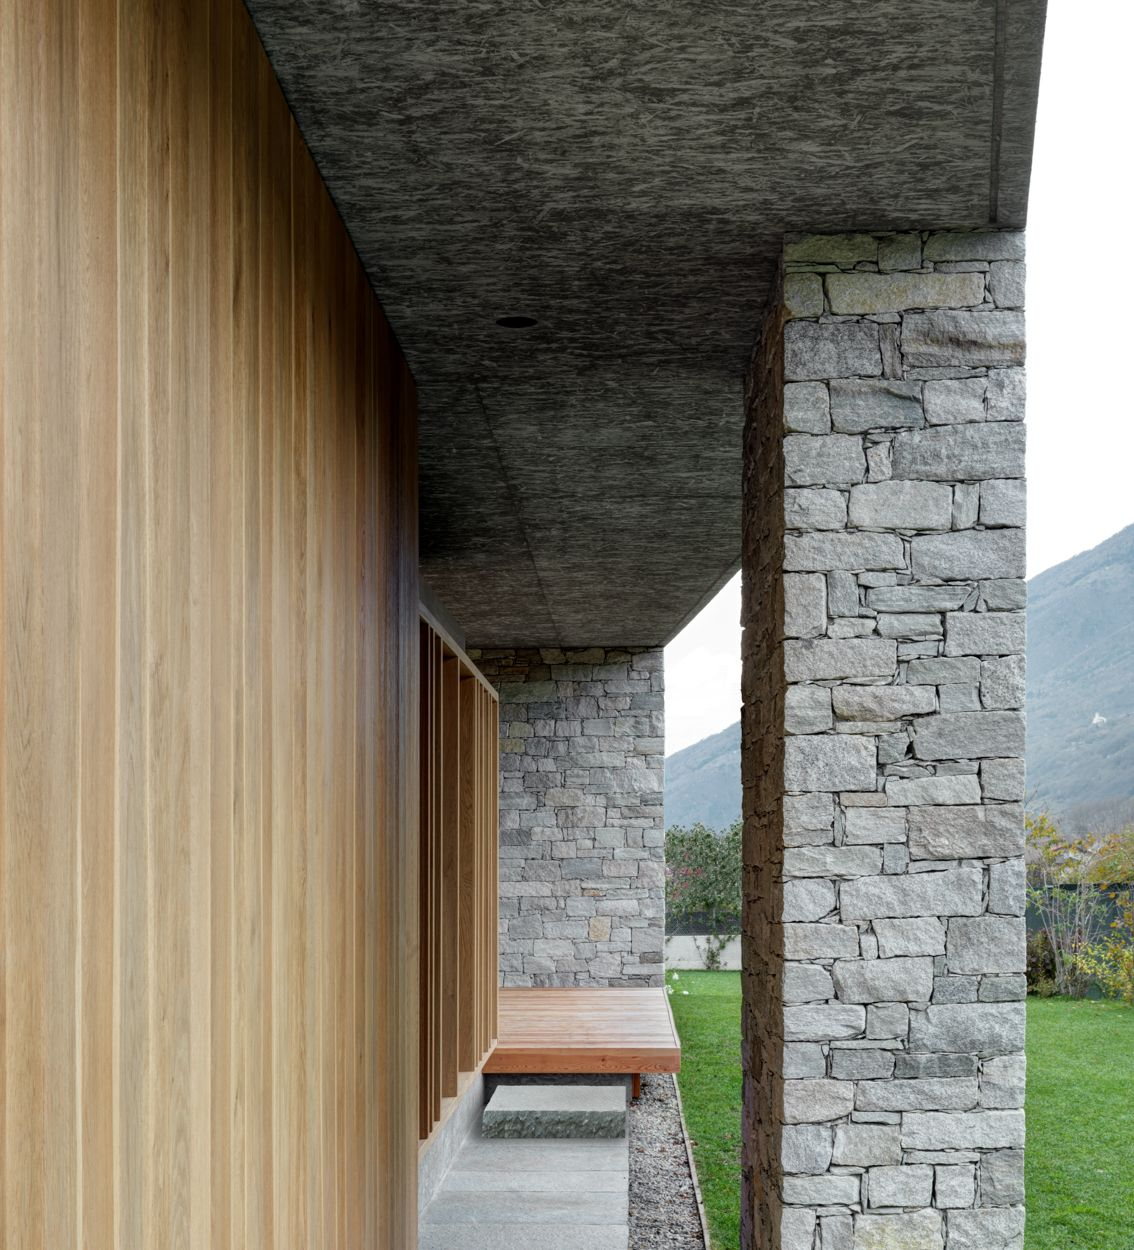 act_romegialli . Private house with patio .  Cosio Valtellino afasia (8)